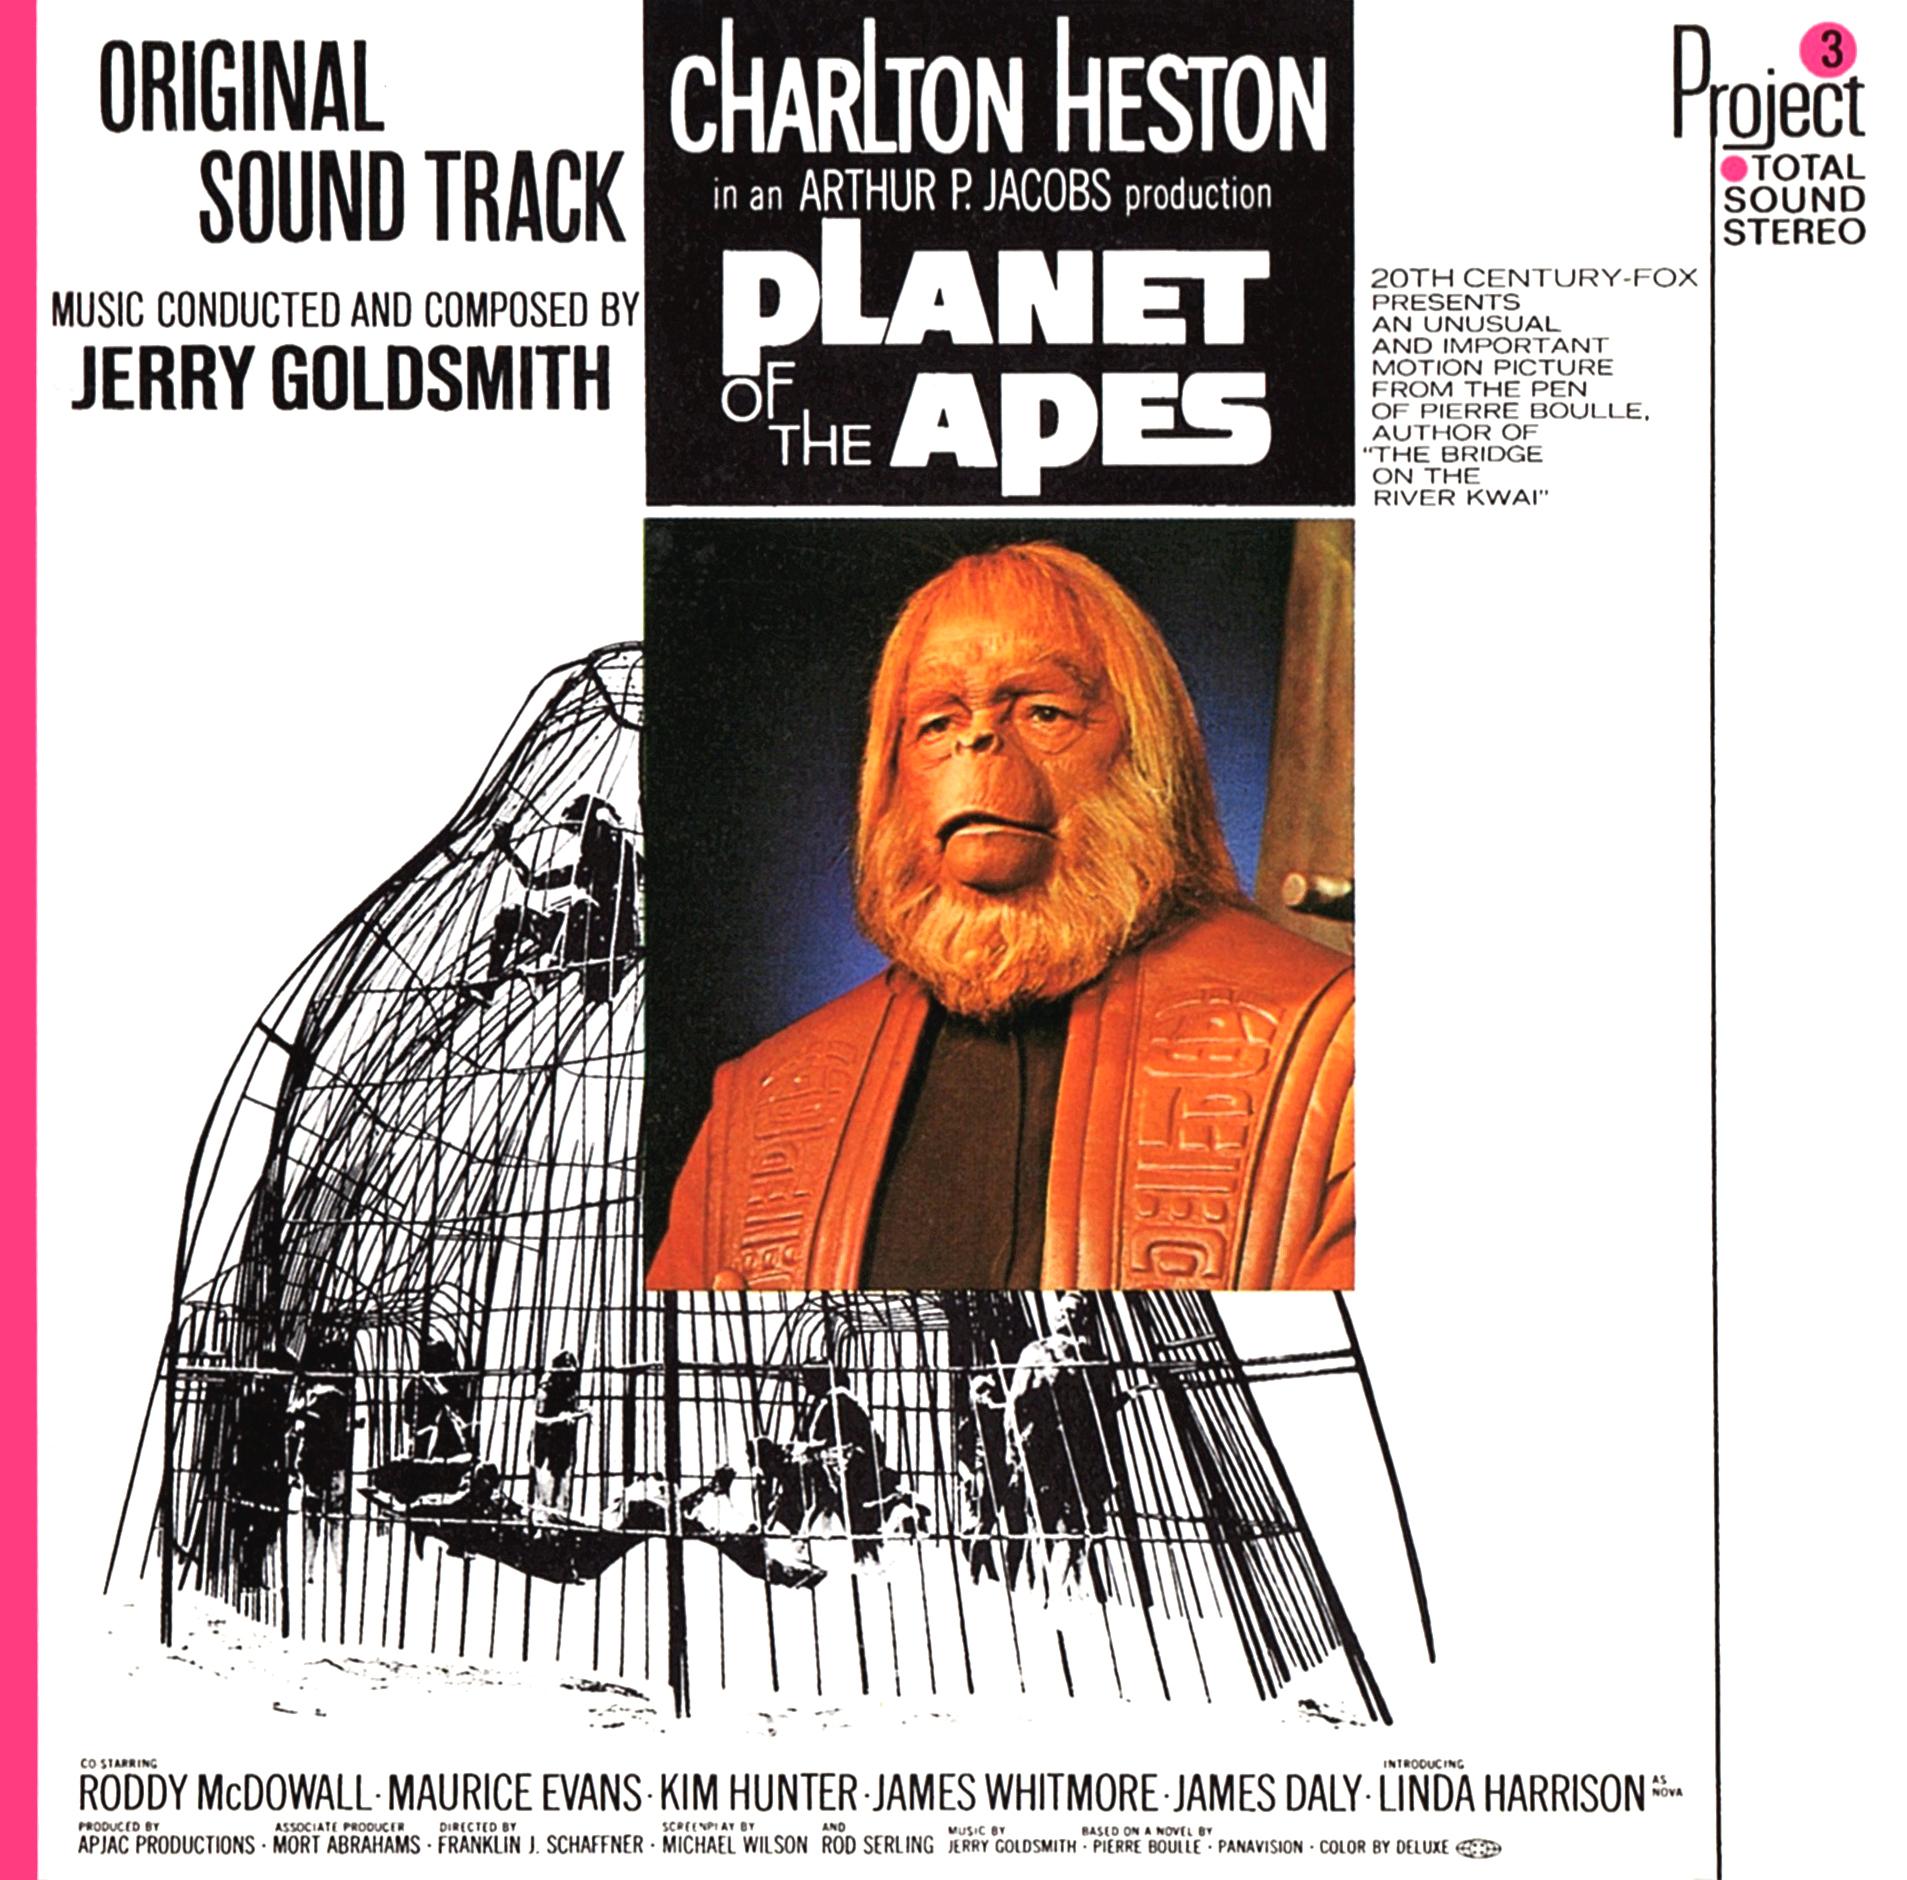 JERRY GOLDSMITH (ジェリー・ゴールドスミス)『PLANET OF THE APES/ORIGINAL SOUND TRACK (猿の惑星/オリジナル・サウンドトラック)』高画質CDジャケット画像 (ジャケ写)